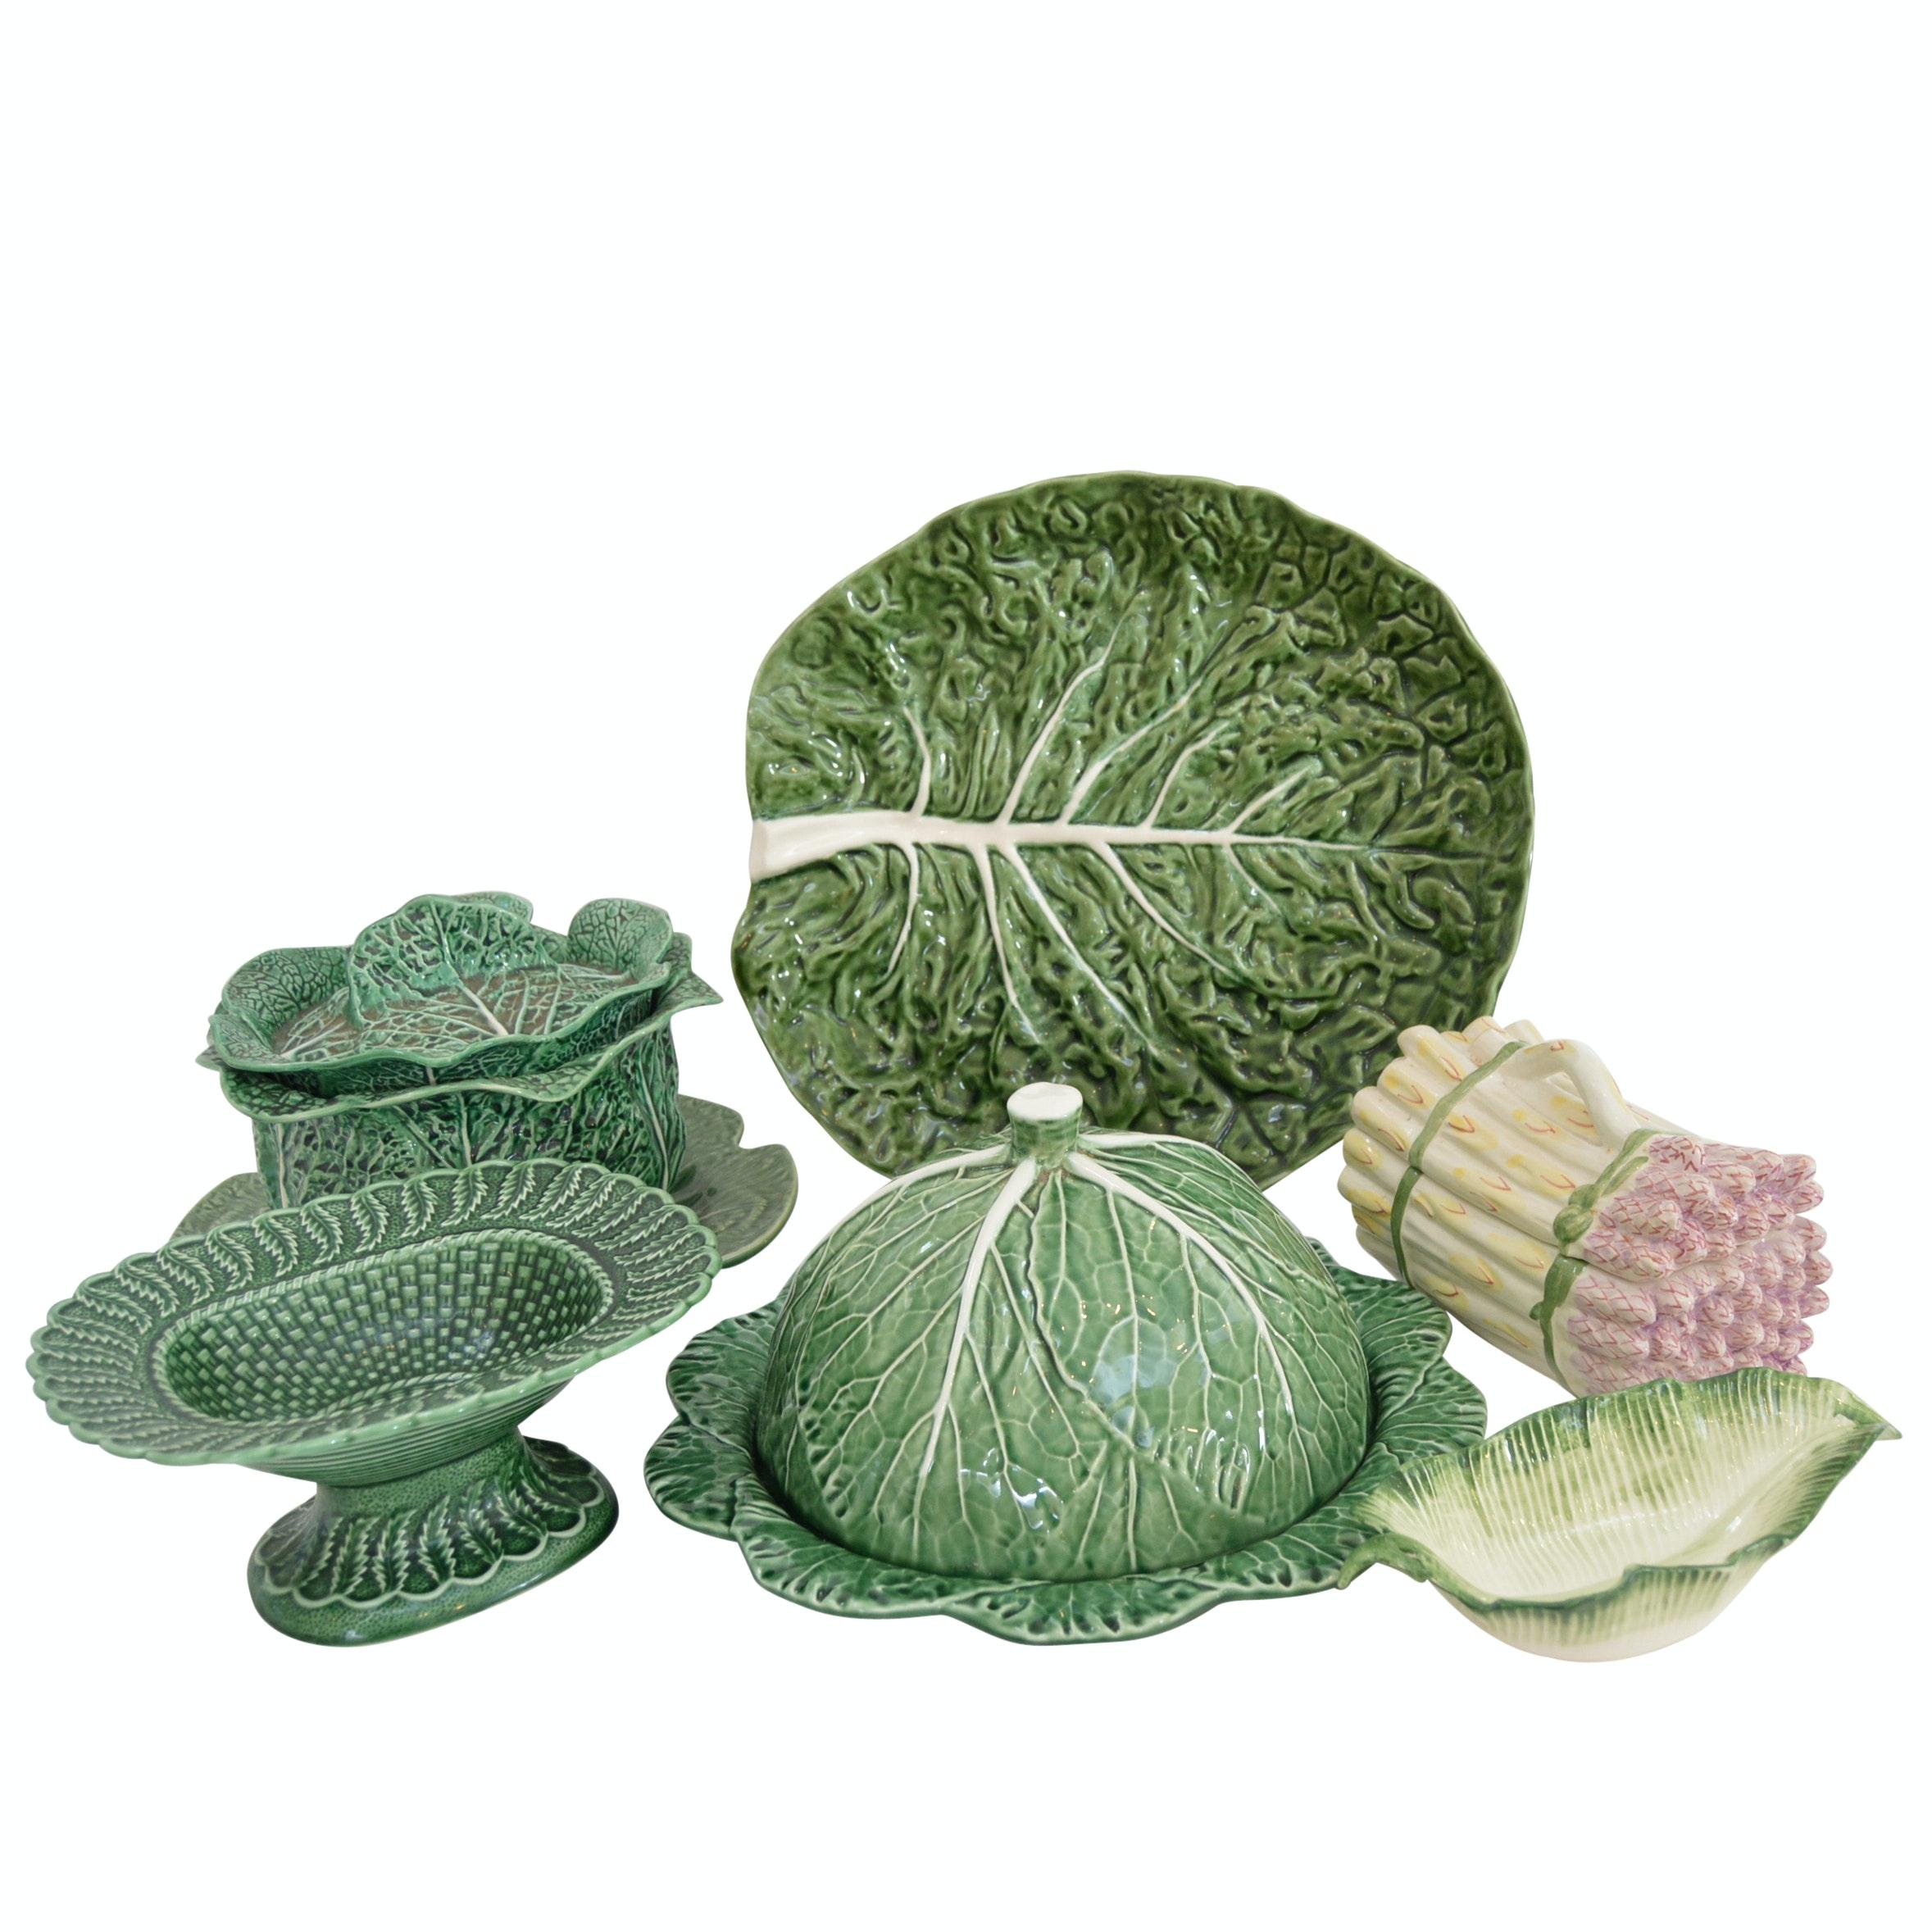 Portuguese Majolica Cabbage Leaf Serveware